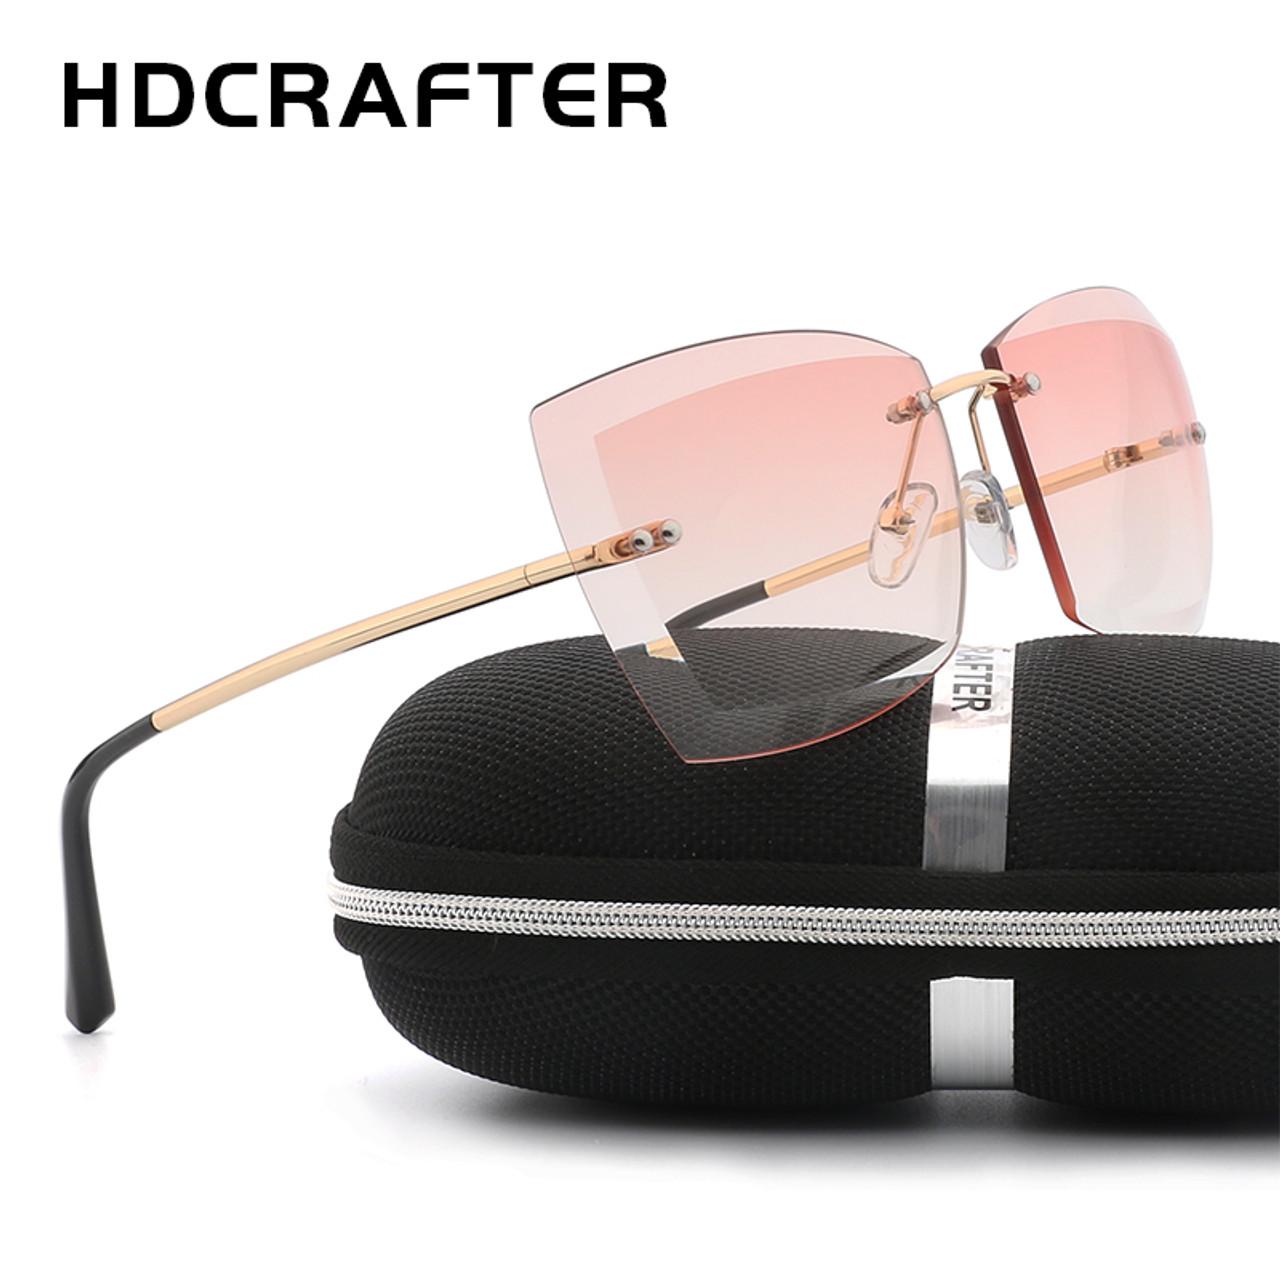 2ec693dfcc0 HDCRAFTER Oversized Women Sunglasses Square Rimless Diamond cutting Lens  Brand Designer Fashion Shades Sun Glasses With Box - OnshopDeals.Com